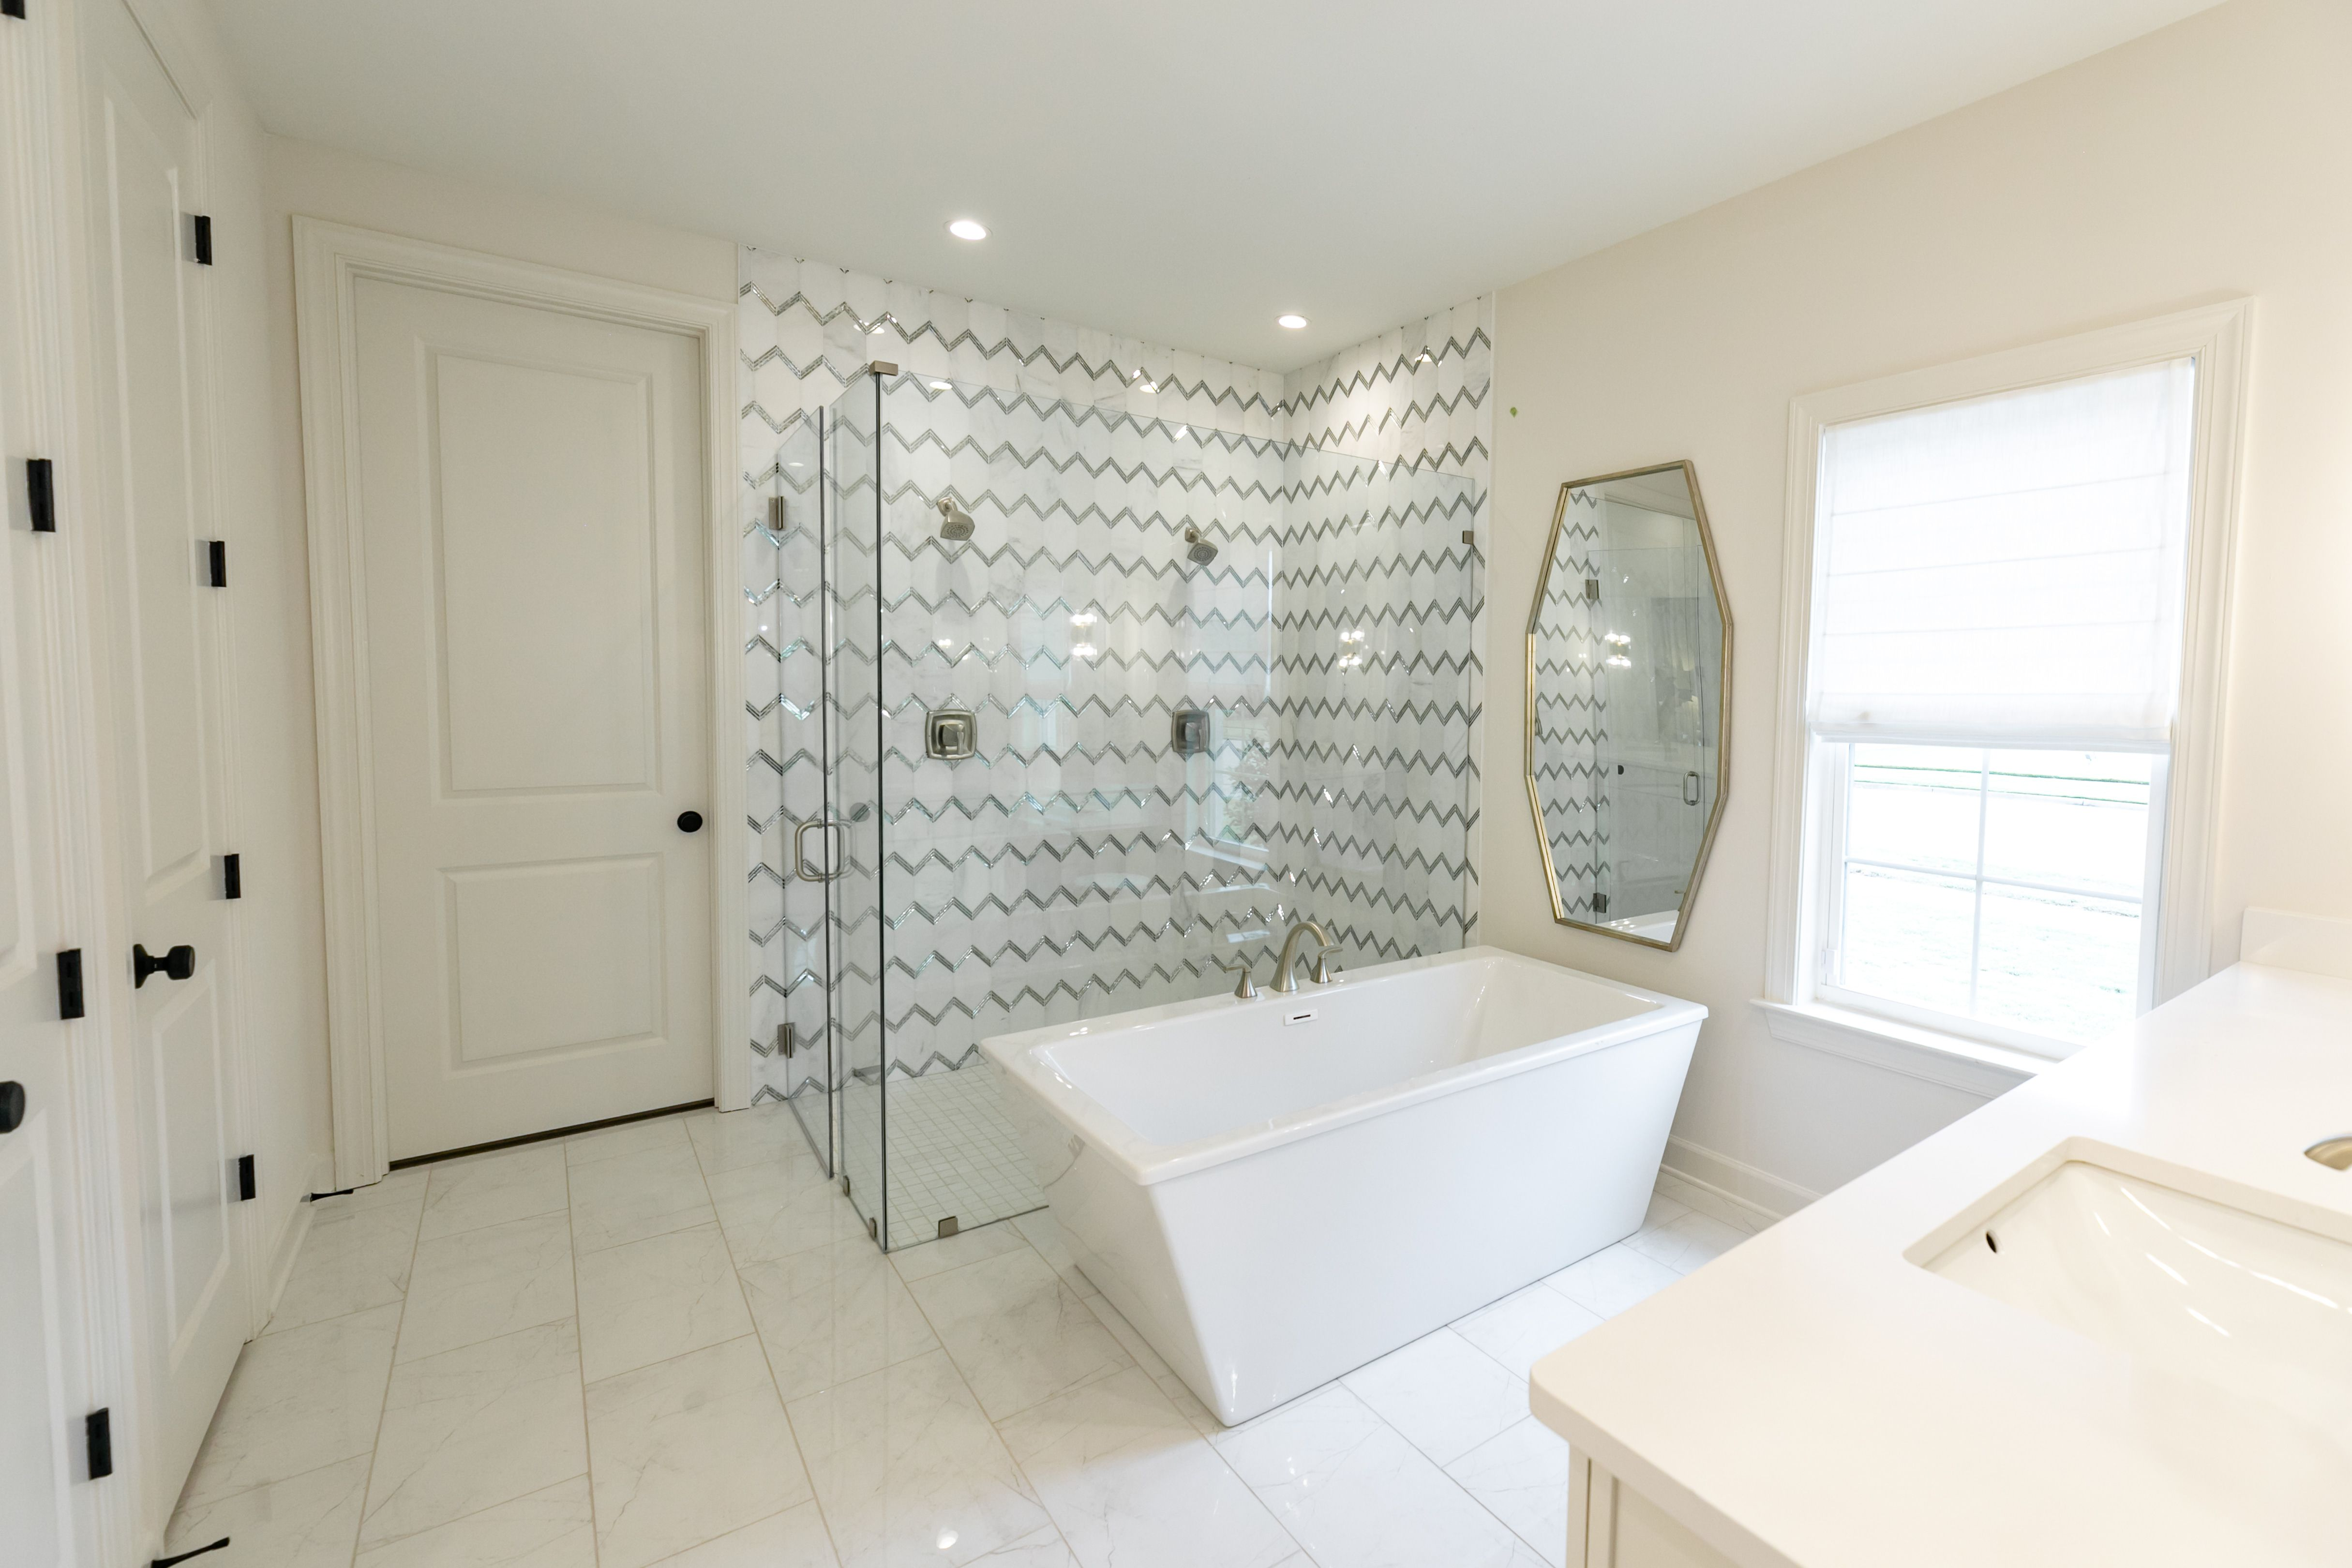 Bathroom featured in the Bailey By Regency Homebuilders in Memphis, TN